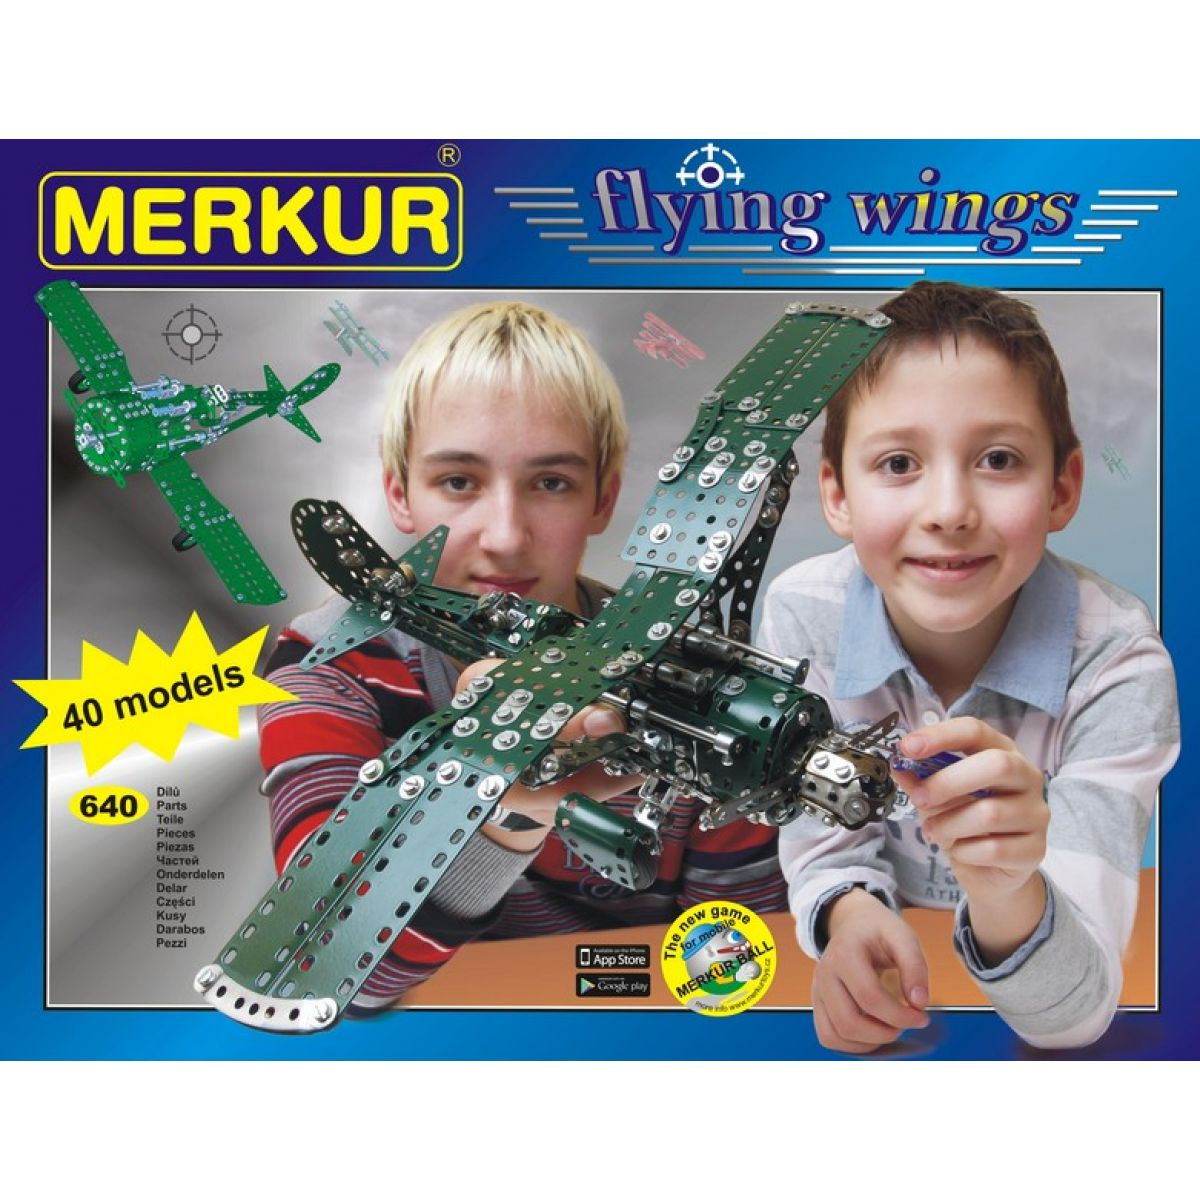 Merkur Flying wings 40 modelů